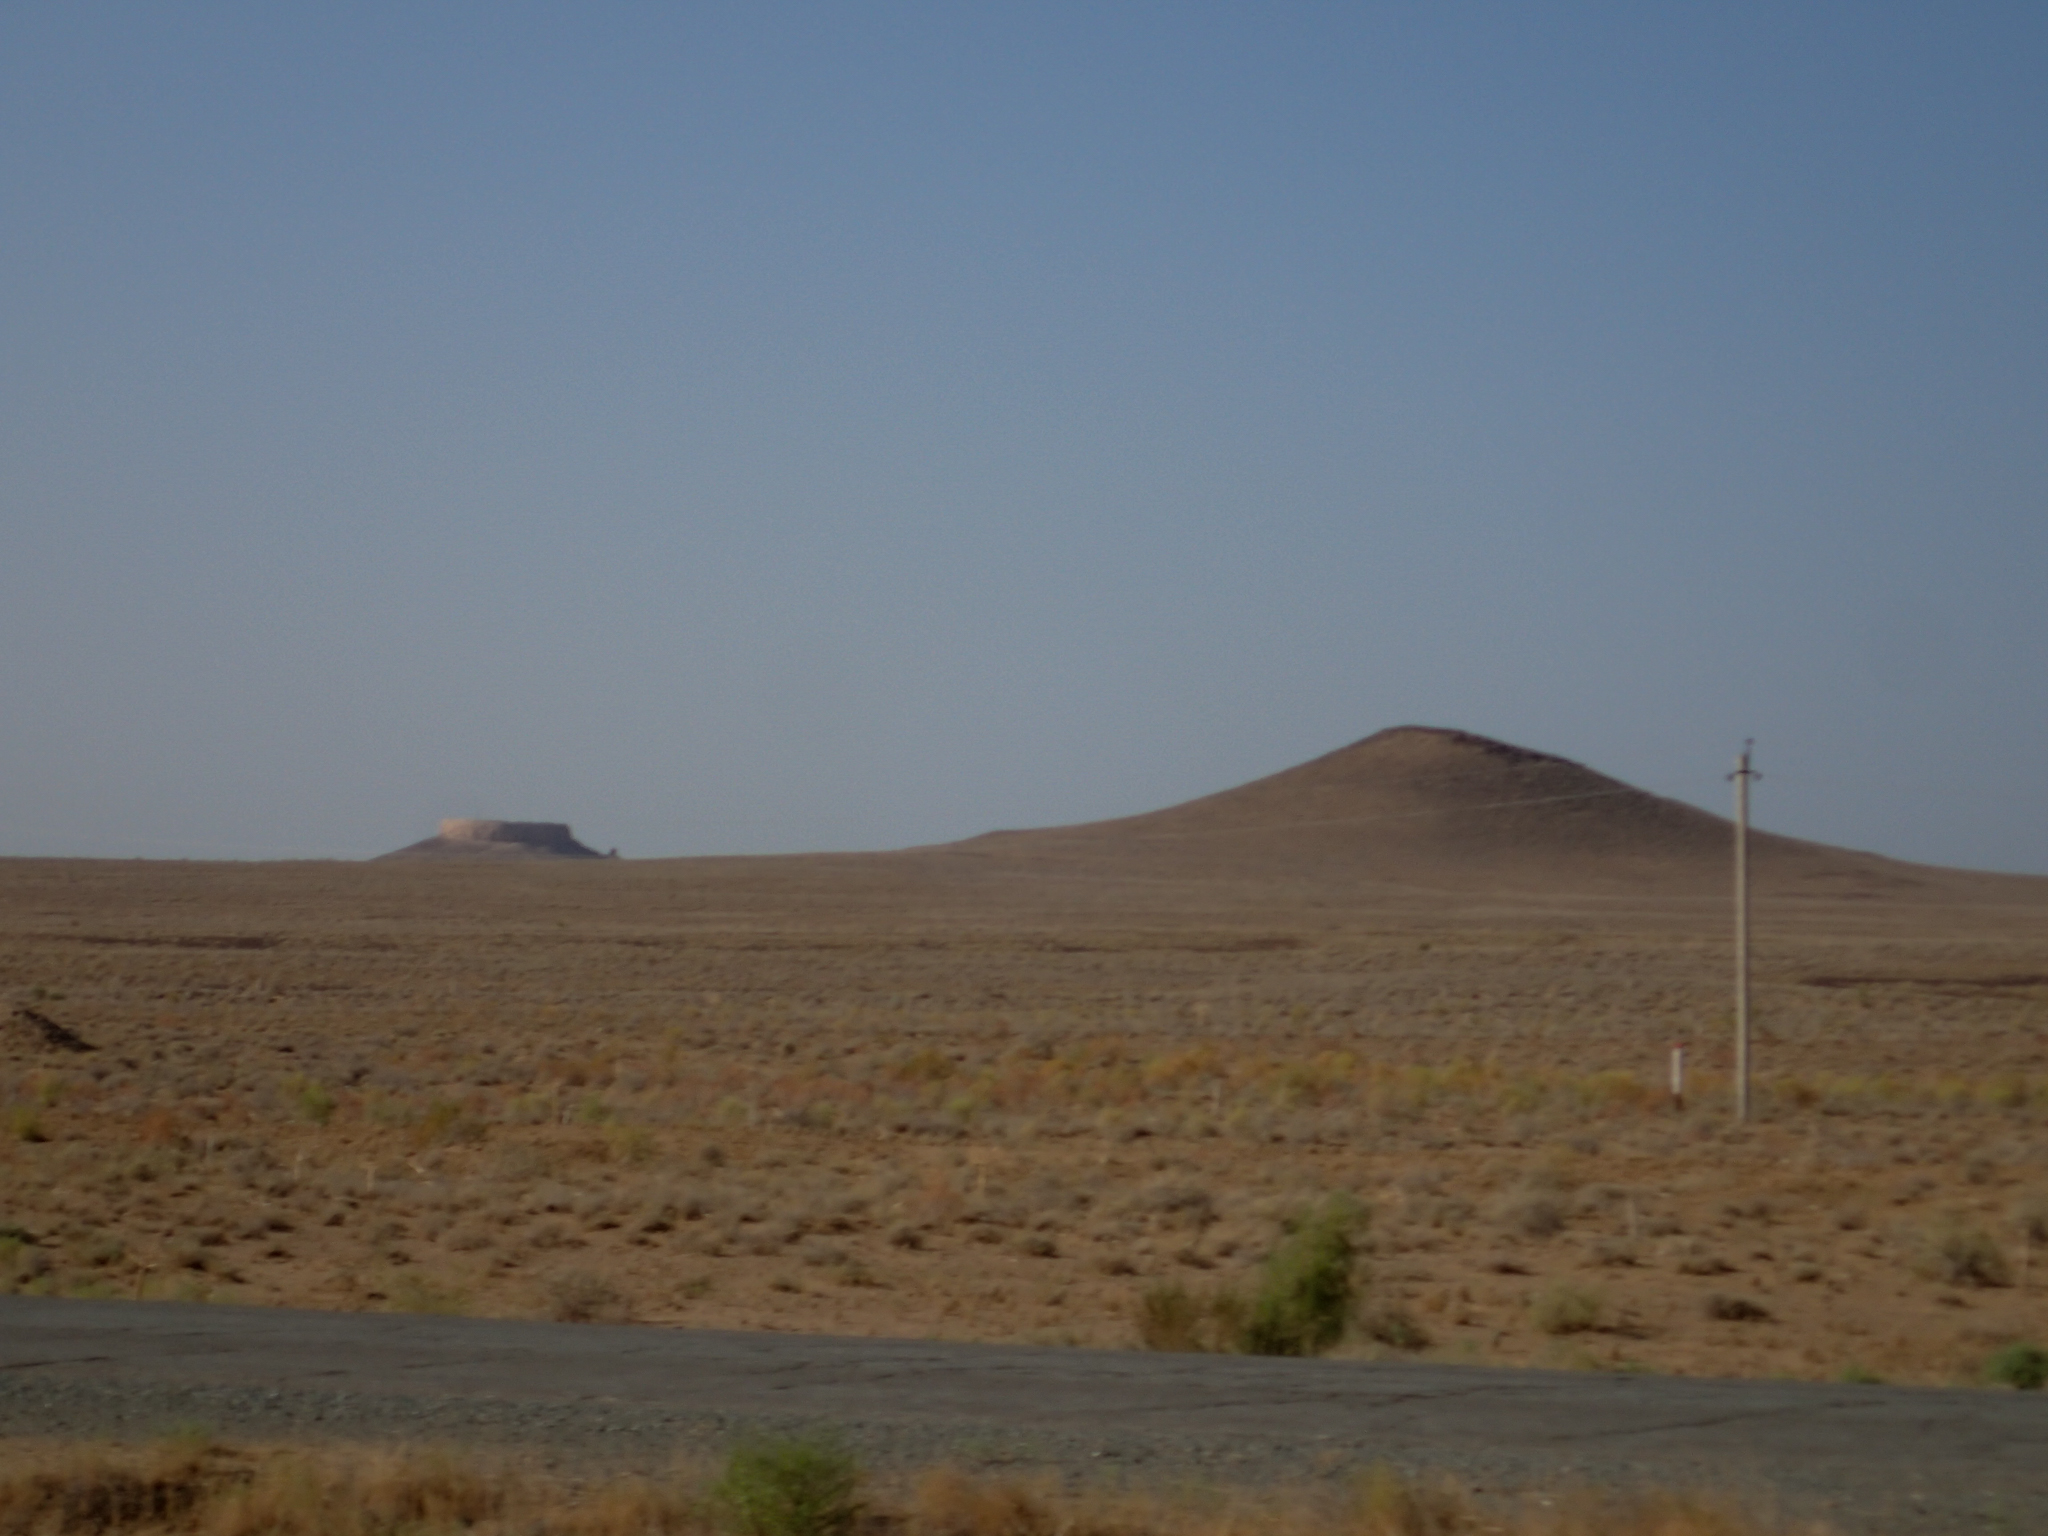 Strange rock formations - like the Wild West